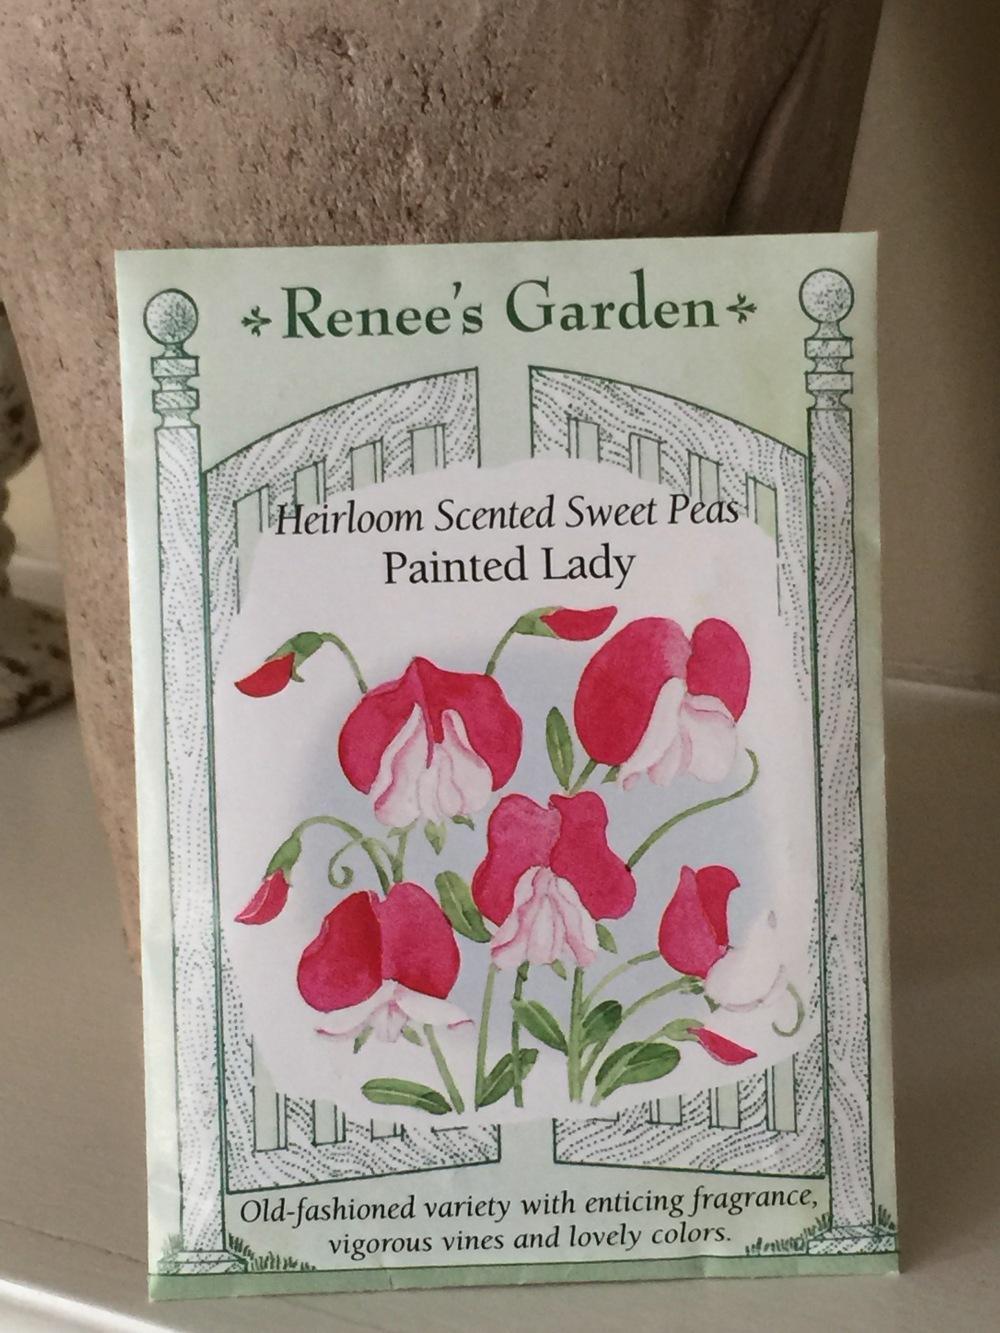 Panted Lady Sweet Pea Seeds